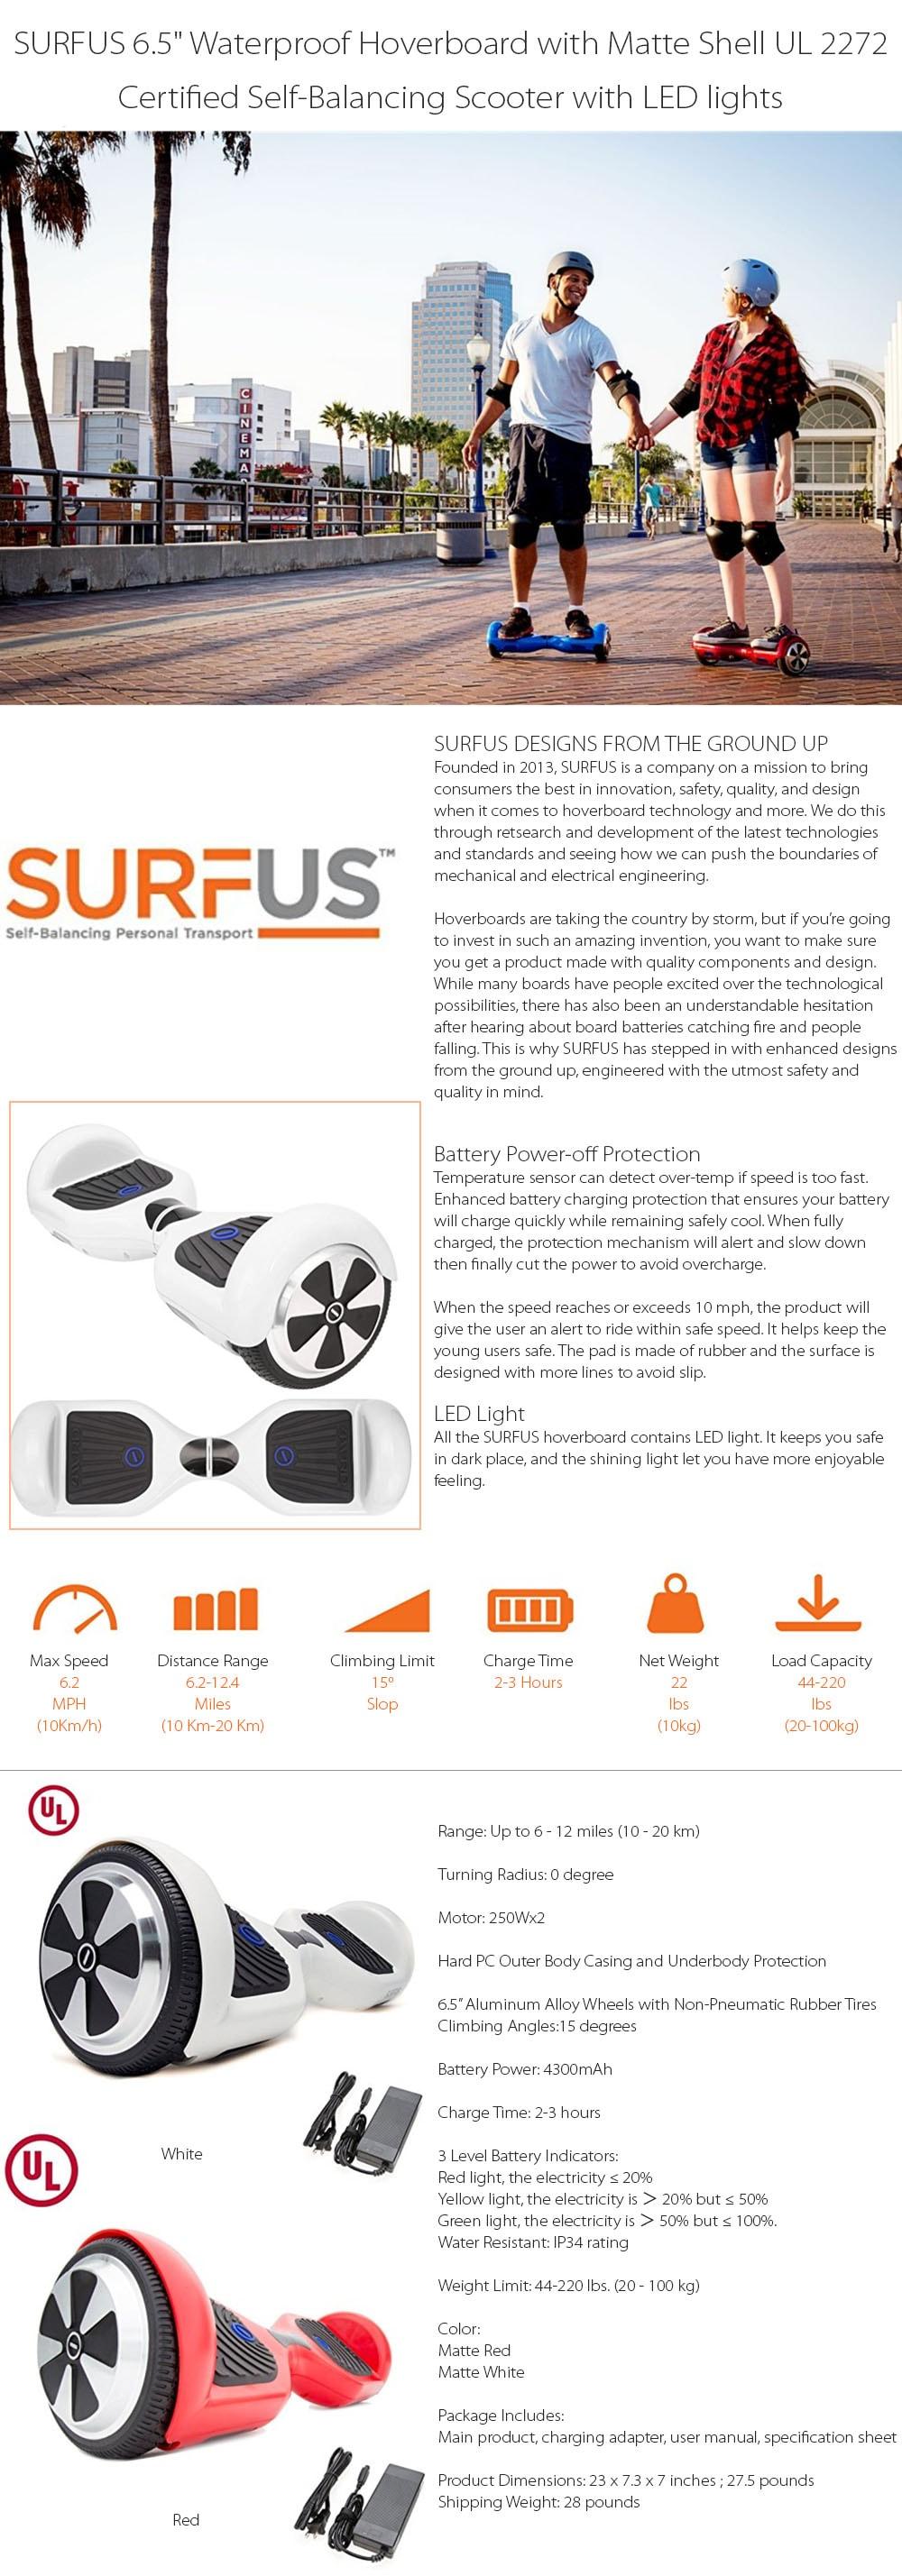 SURFUS Waterproof Hoverboard  Enjoy Your Ride